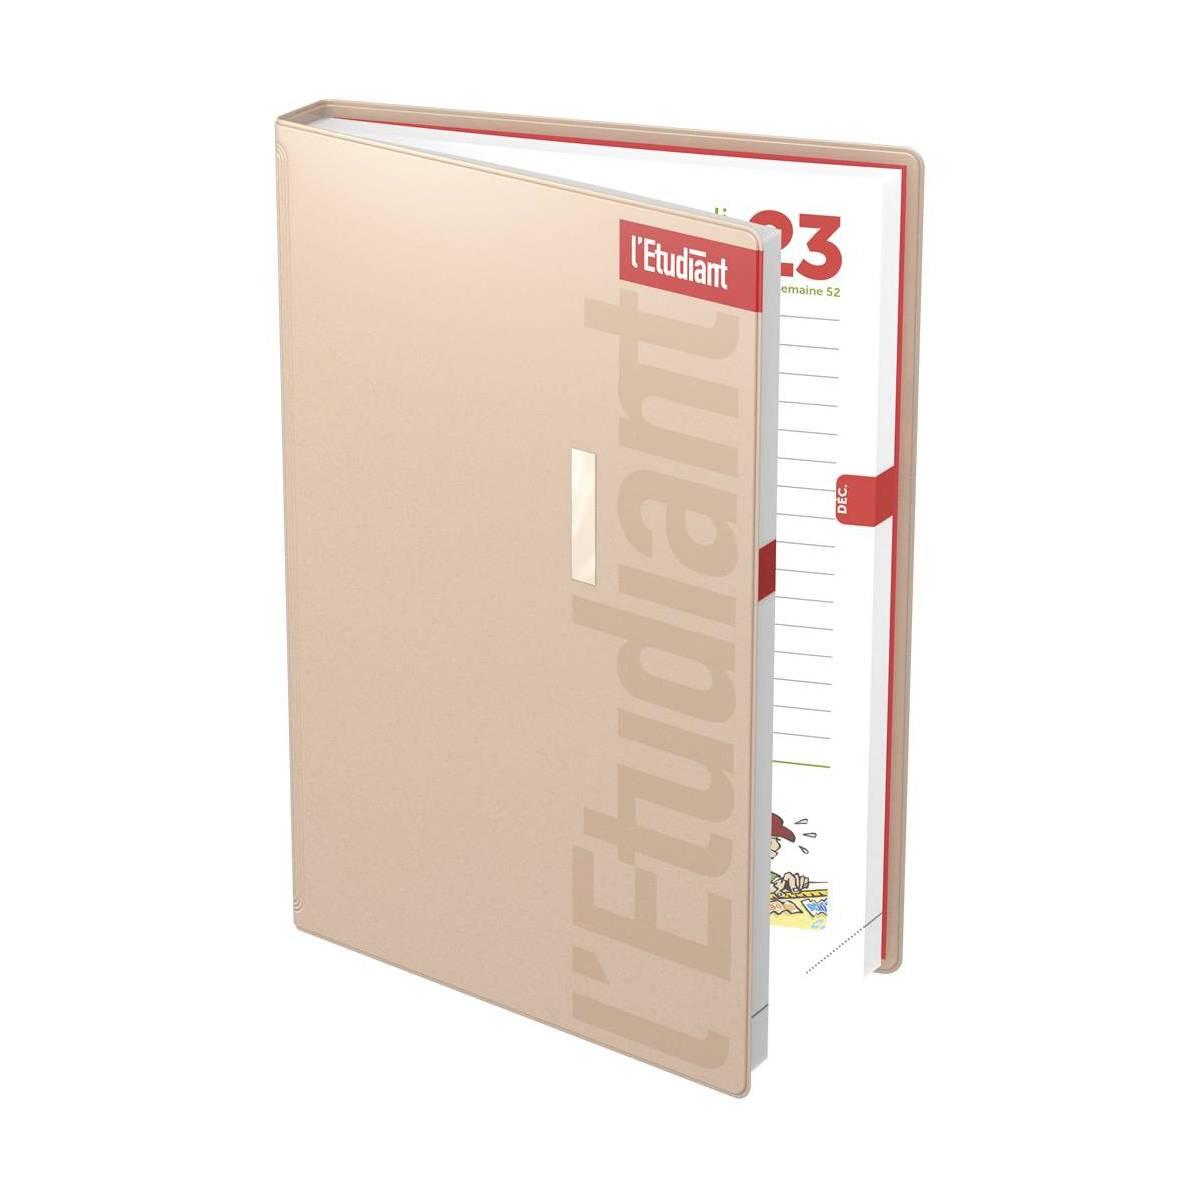 Hamelin - Agenda l'Etudiant Edition Limitée - 2019/2020